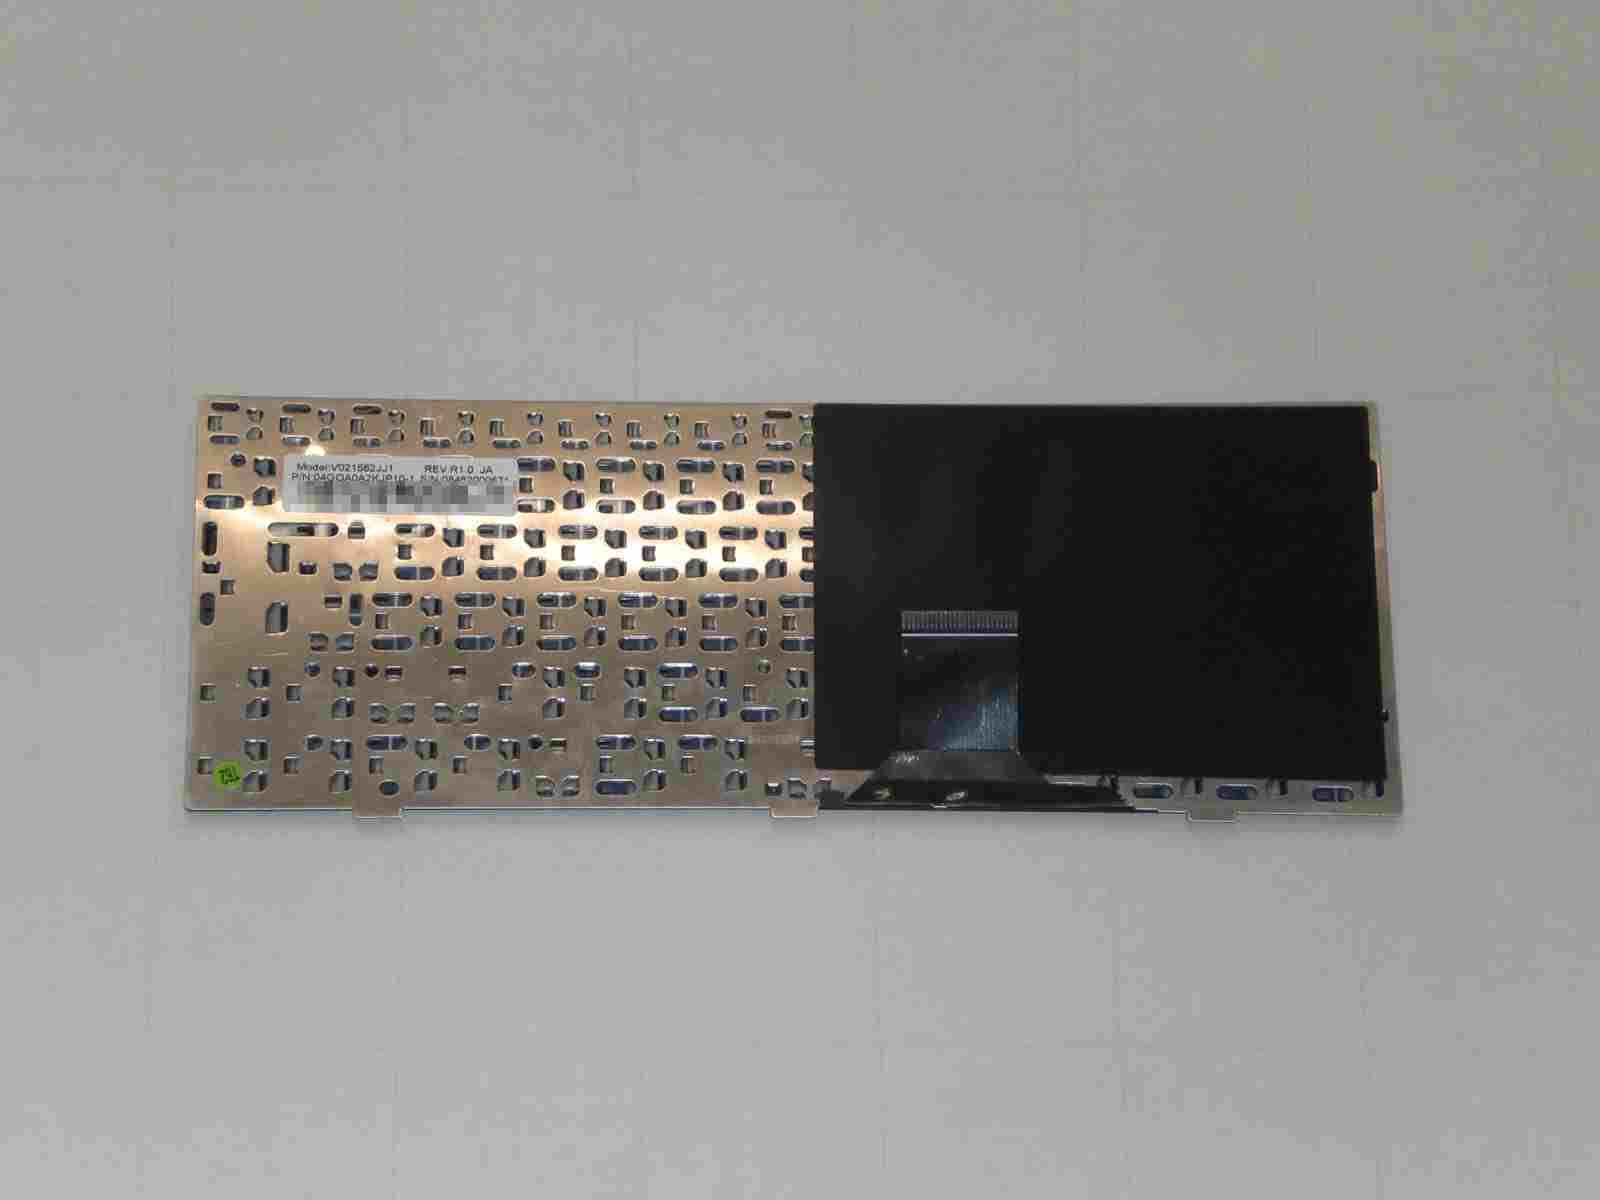 ASUS Eee S101H 筐体の分解 分解したキーボード 裏